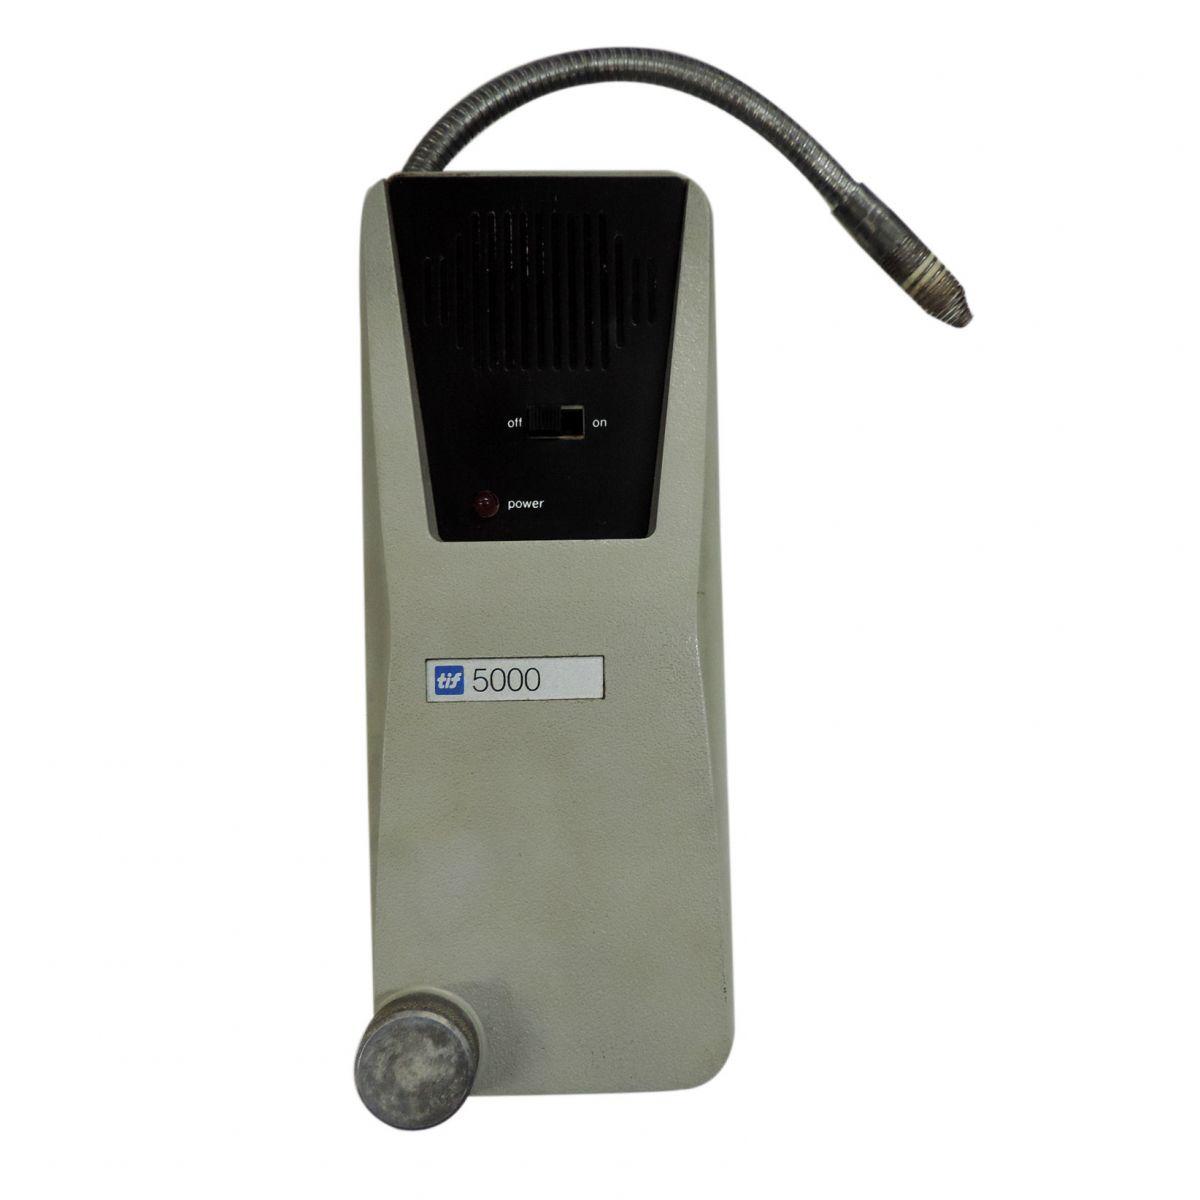 Detector De Vazamento De Halogenados Tif 5000 Usado